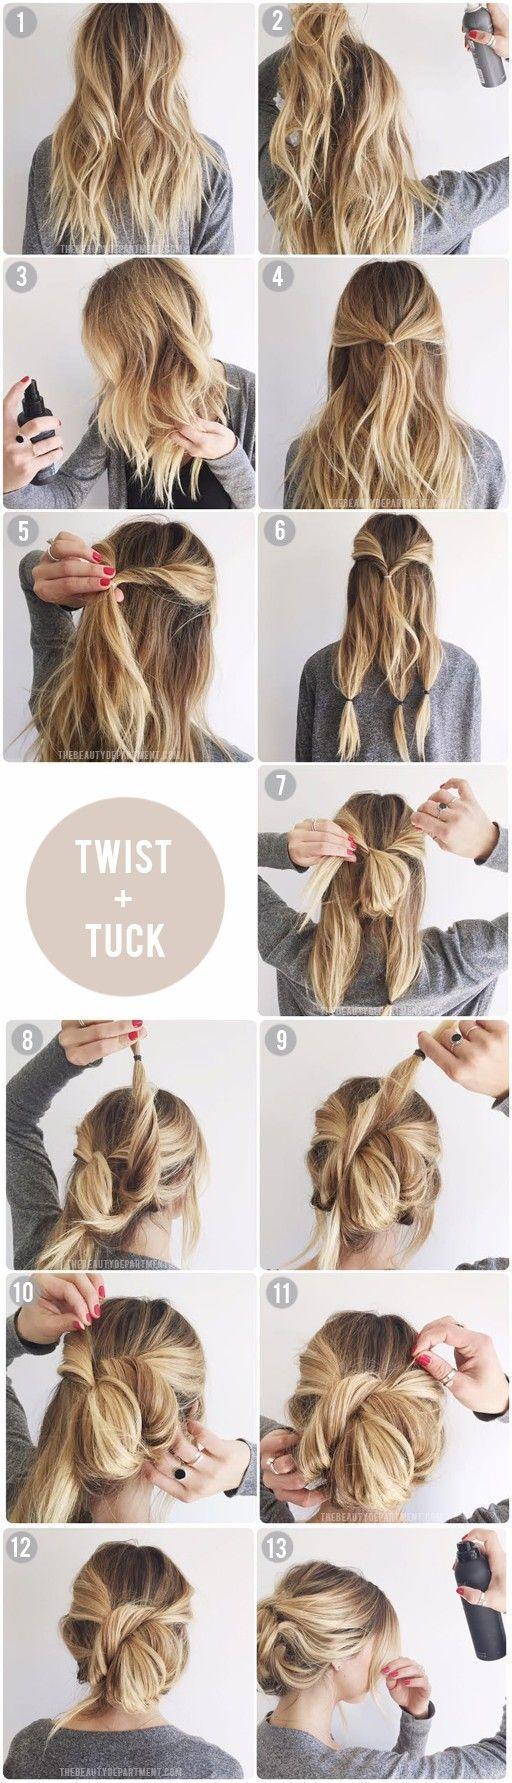 Wondrous 1000 Ideas About Easy Updo Tutorial On Pinterest Updo Tutorial Short Hairstyles Gunalazisus